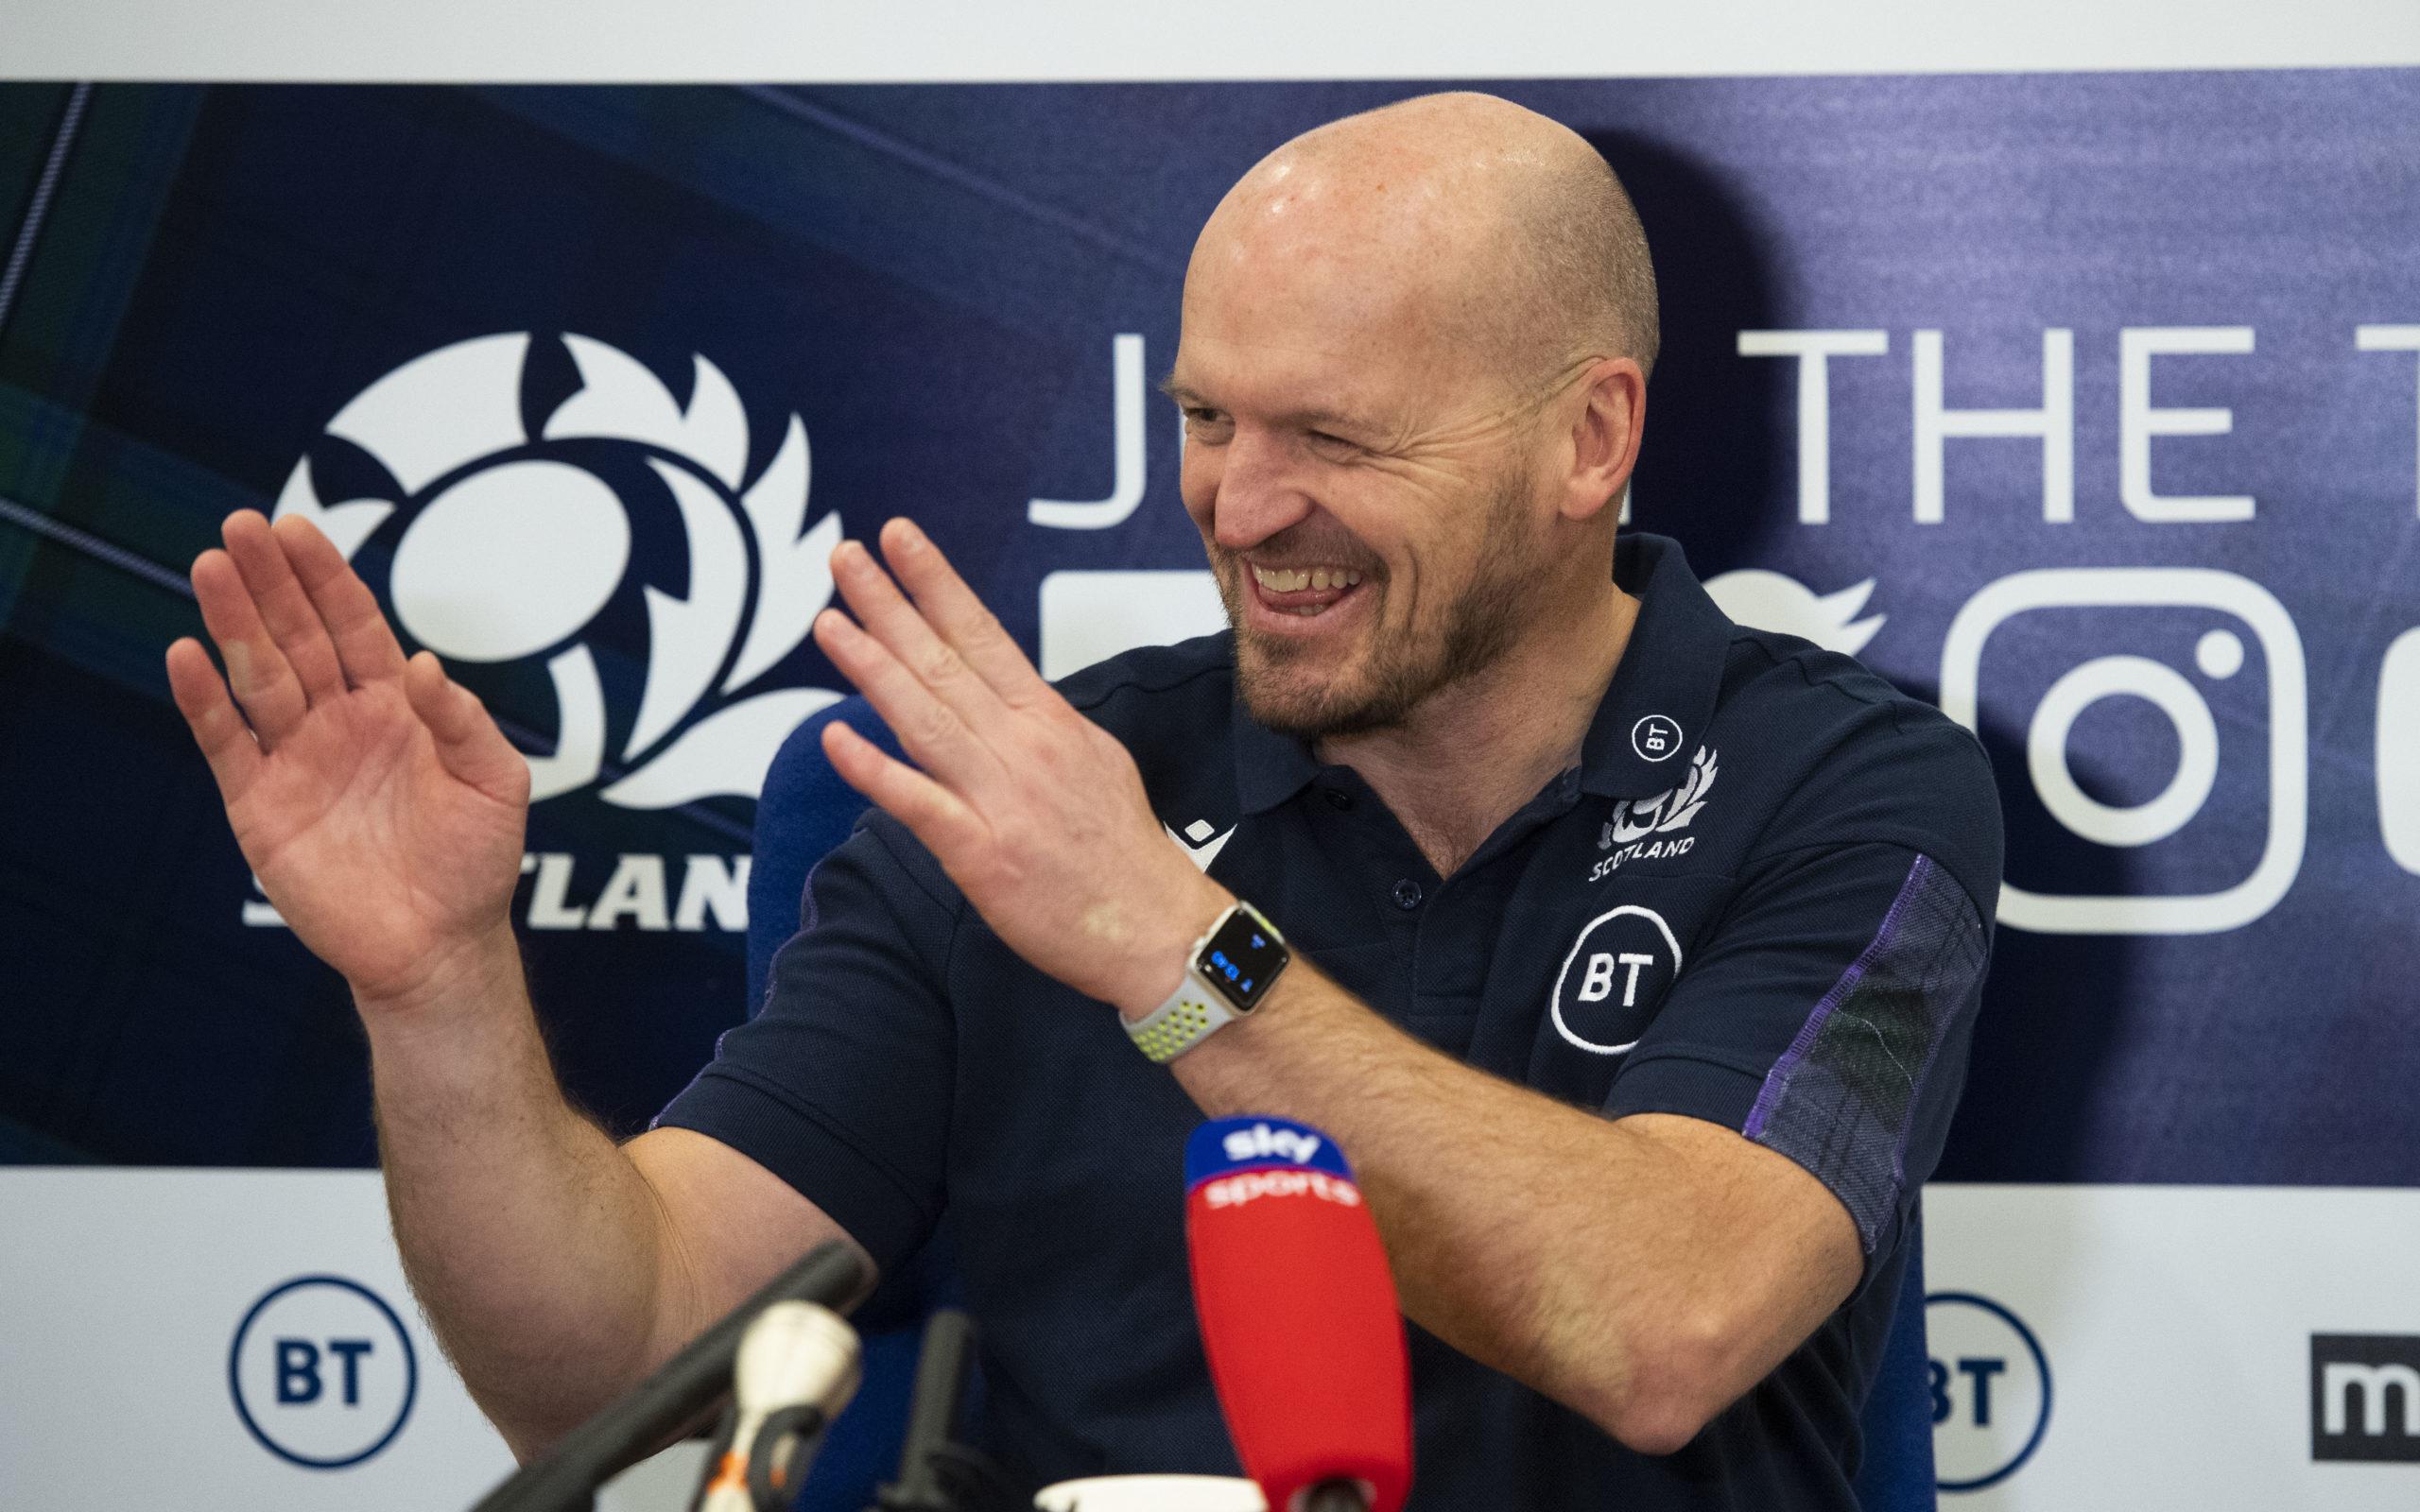 Scotland head coach Gregor Townsend announces his squad to face England.